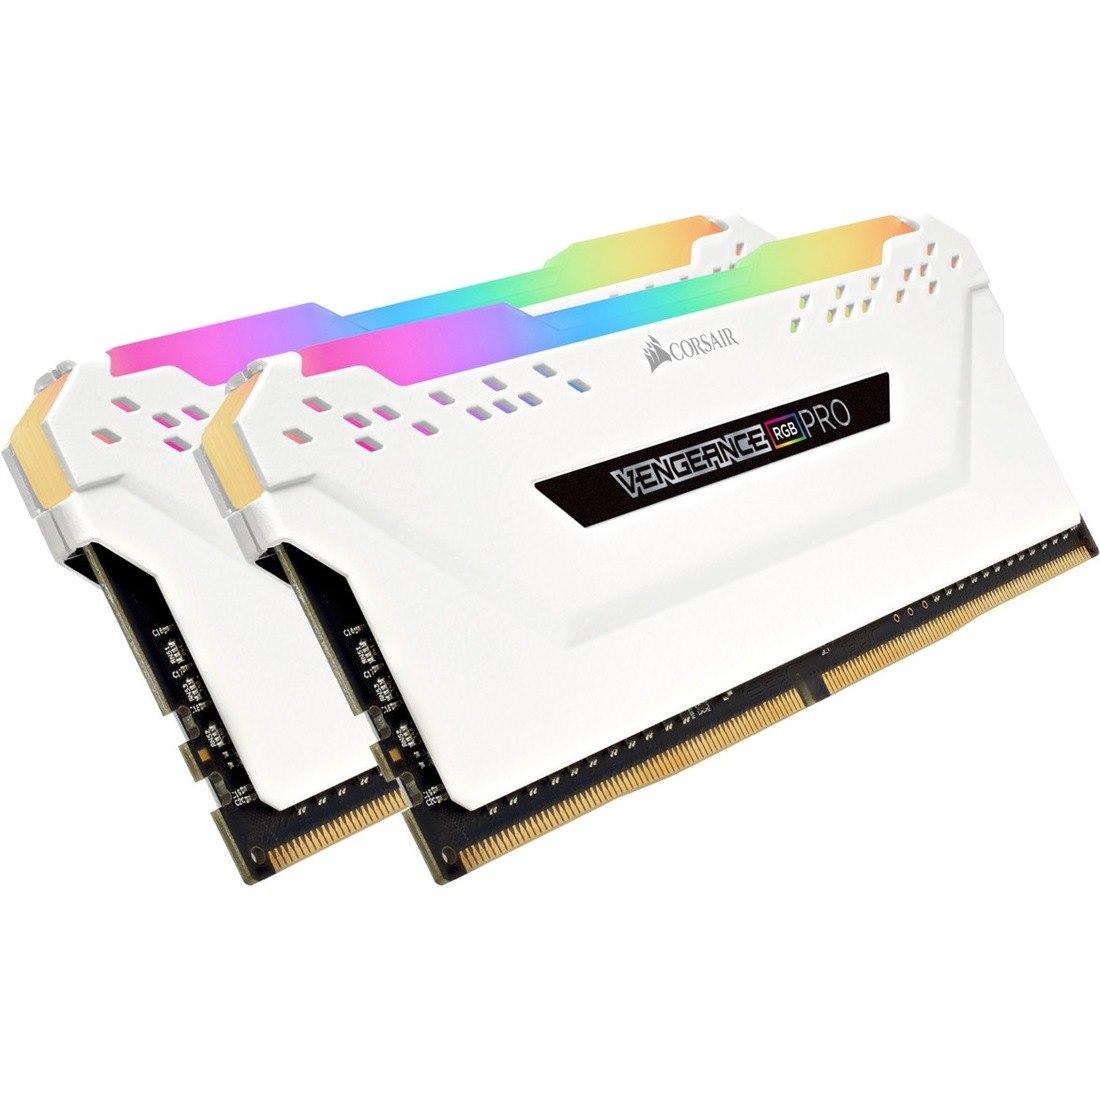 Corsair Vengeance RGB Pro RAM Module - 16 GB (2 x 8 GB) - DDR4-3000/PC4-24000 DDR4 SDRAM - CL15 - 1.35 V